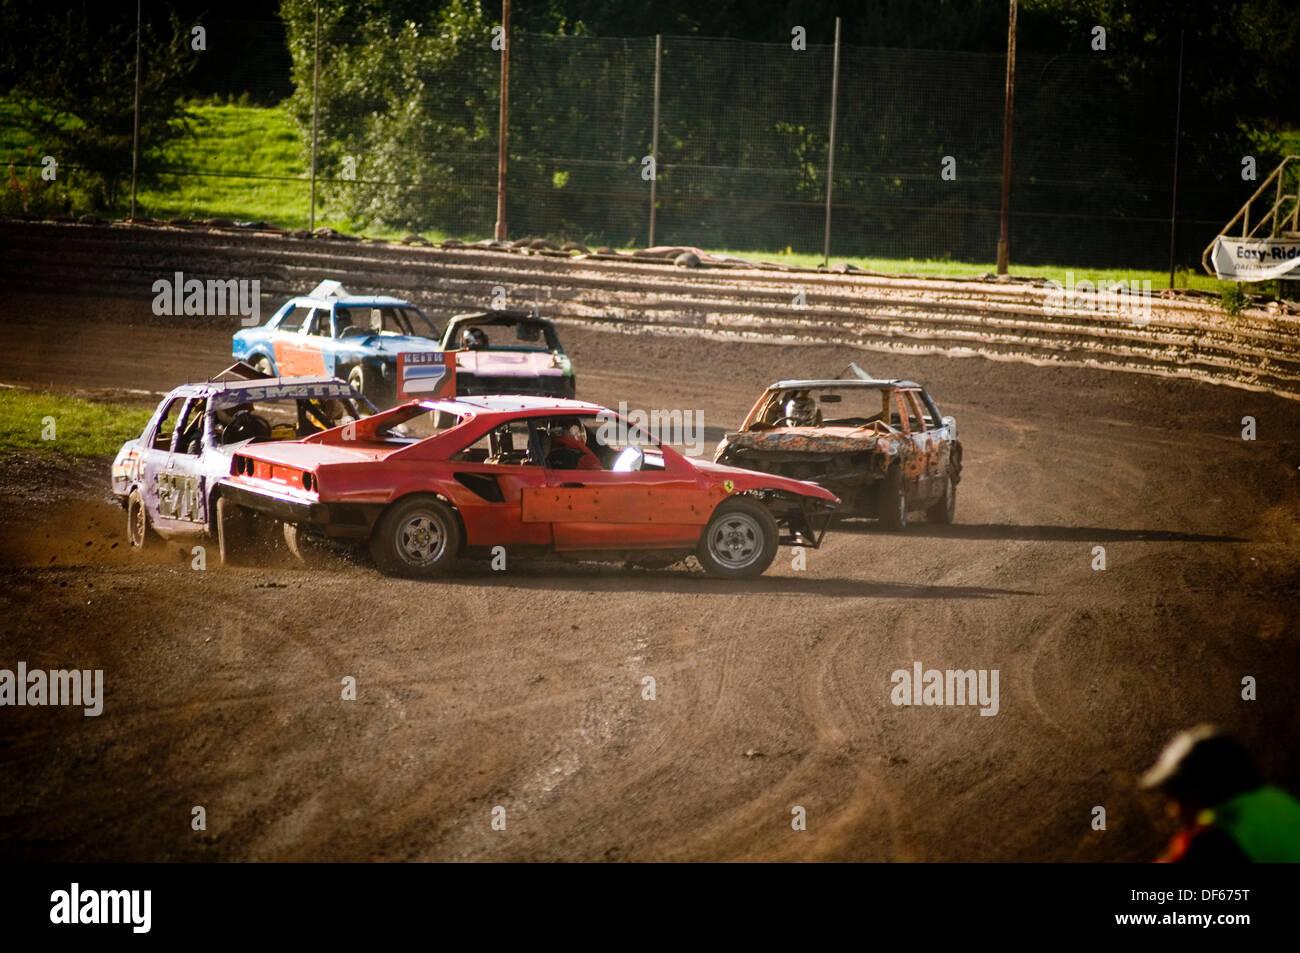 Ferrari banger racing car being raced on track car crash crashing ...